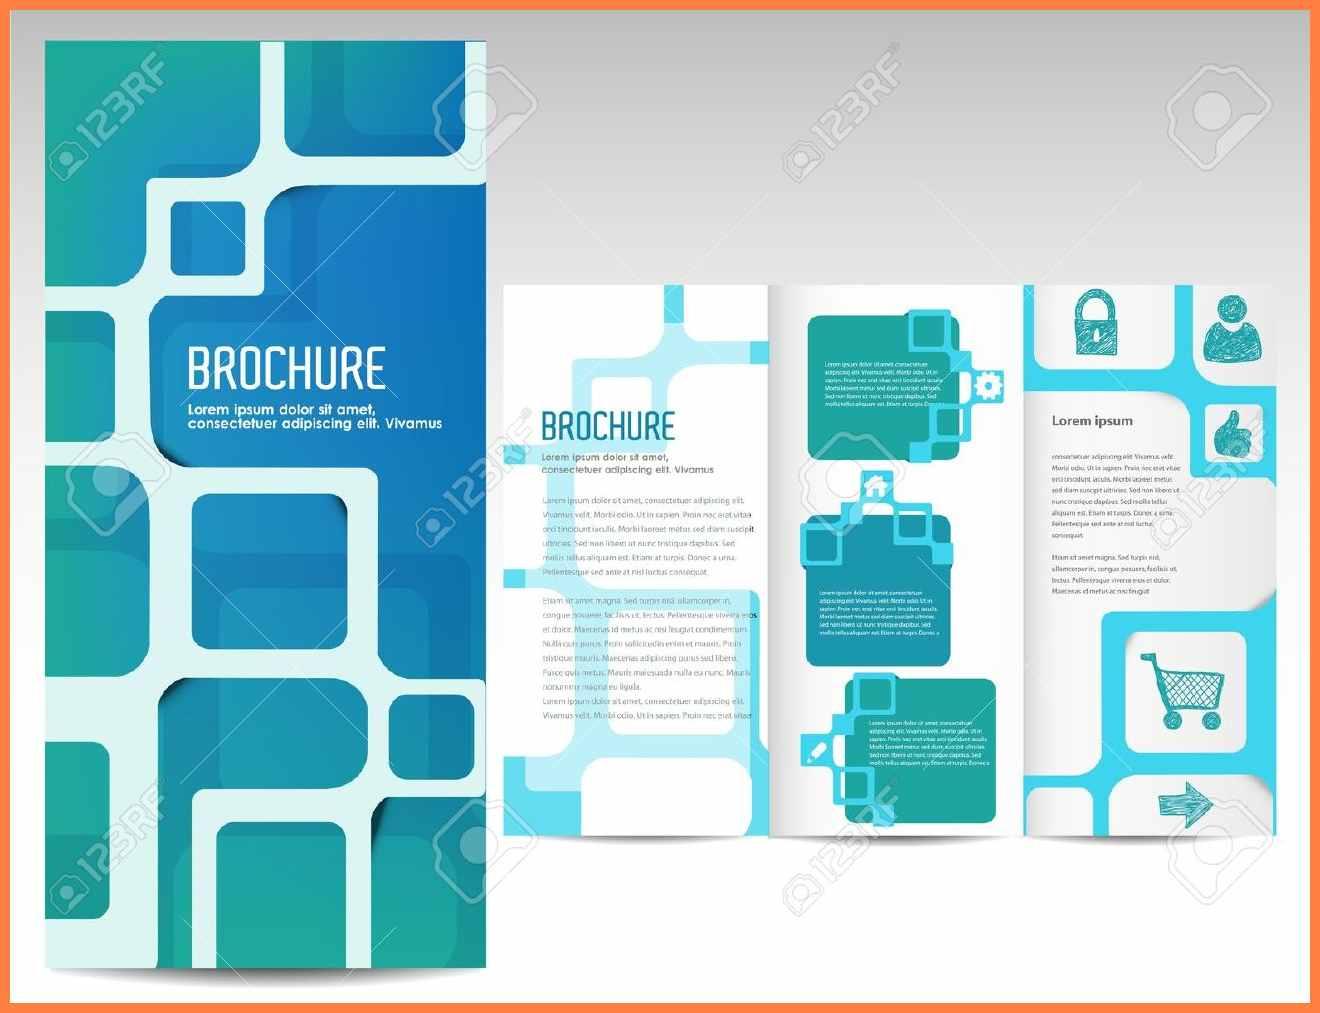 10+ Free Microsoft Word Tri Fold Brochure Templates   Andrew For Free Tri Fold Brochure Templates Microsoft Word